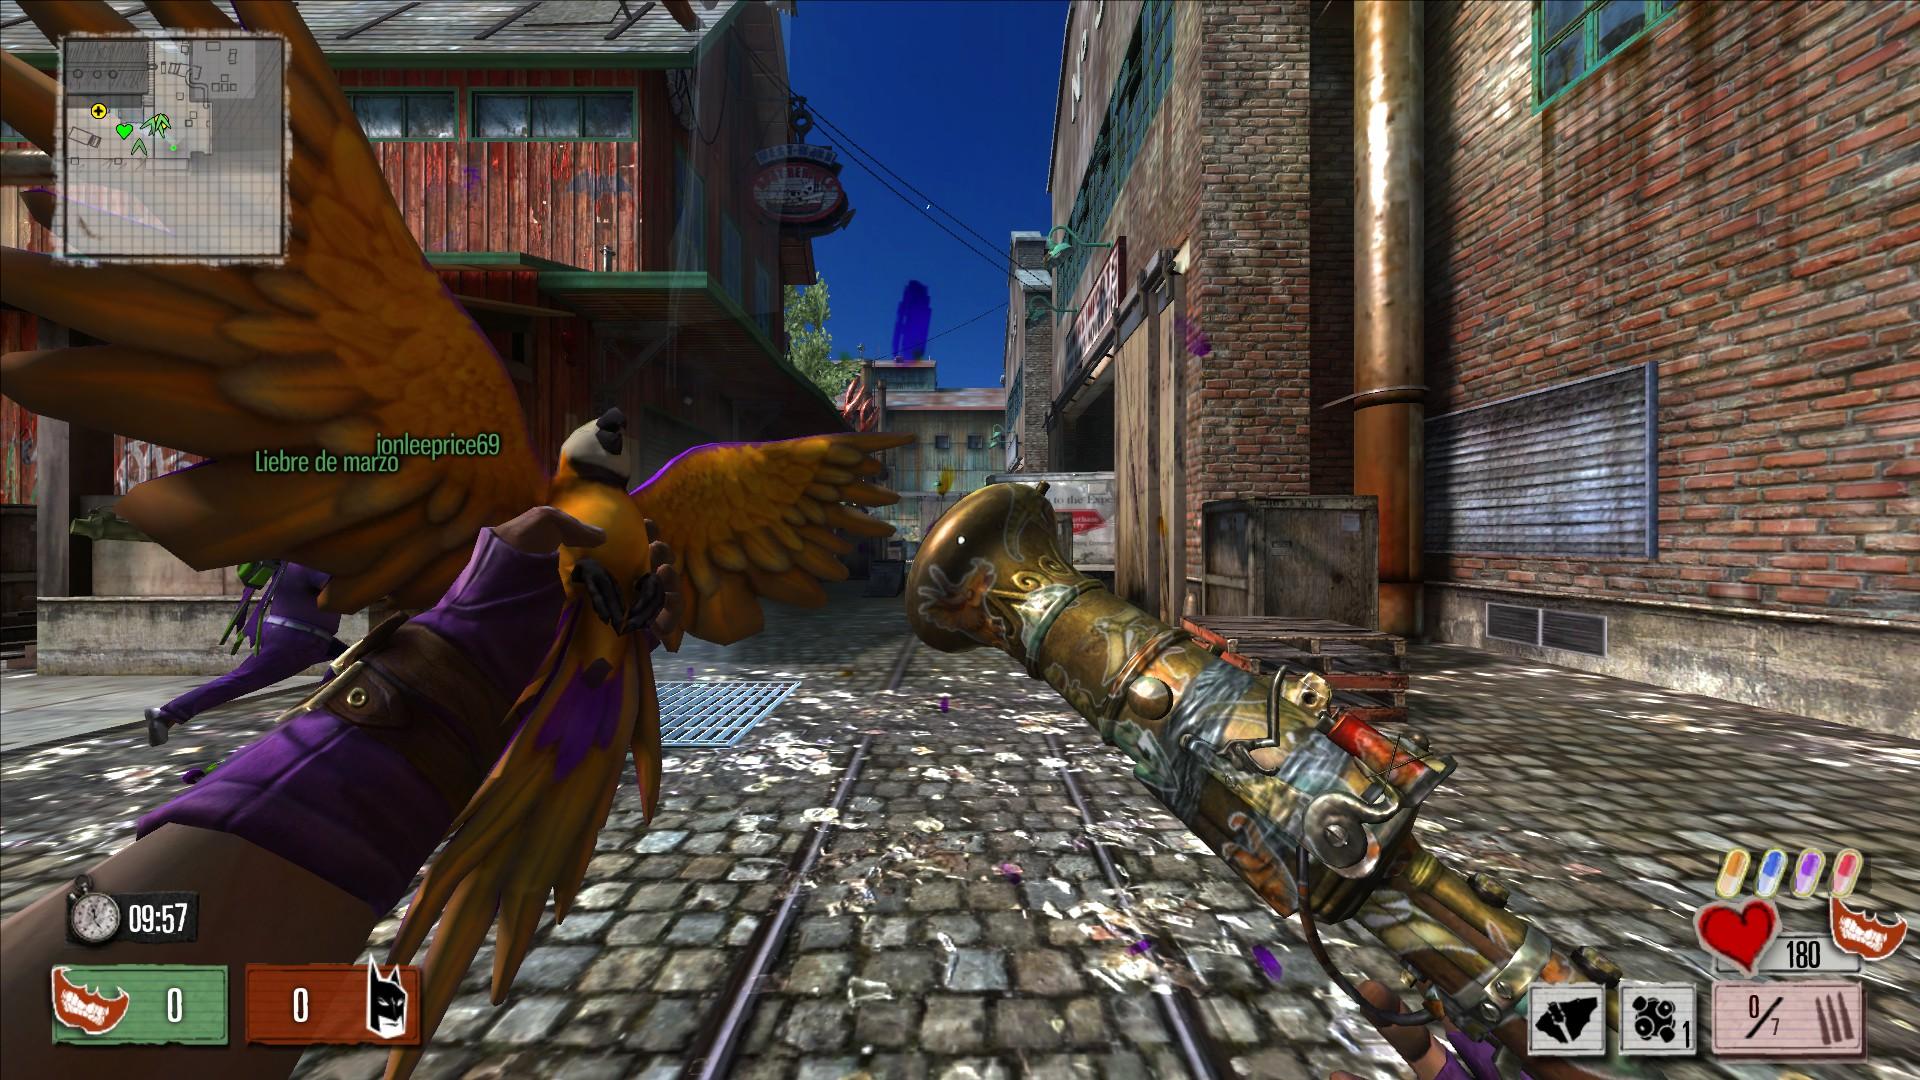 Images - Gotham city impostors matchmaking takes forever